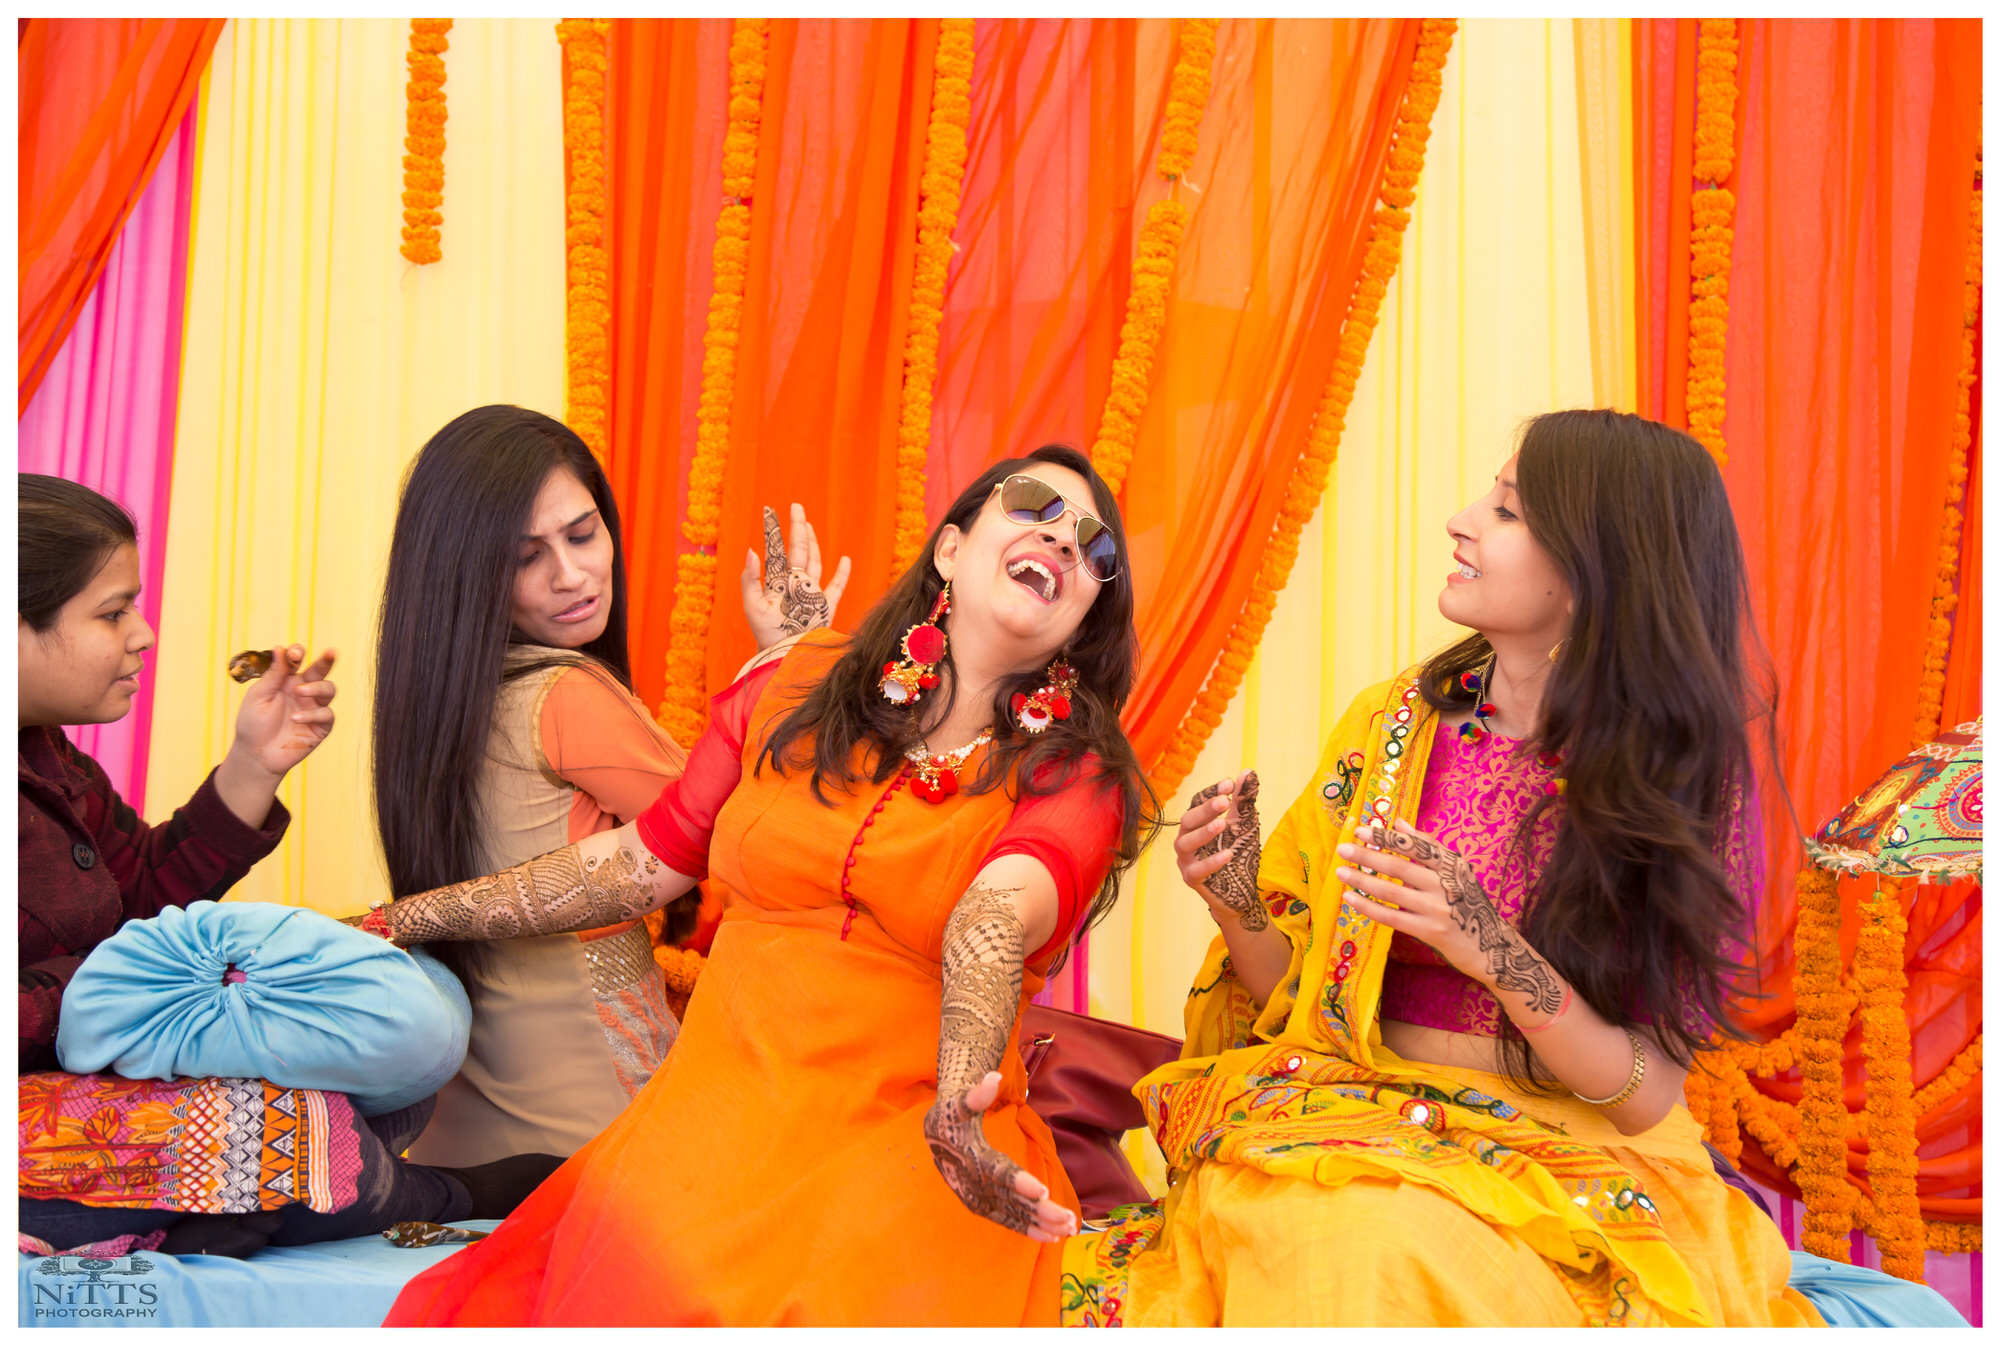 Prateek & Abhilasha (Wedding)-December 02, 2017-100.JPG